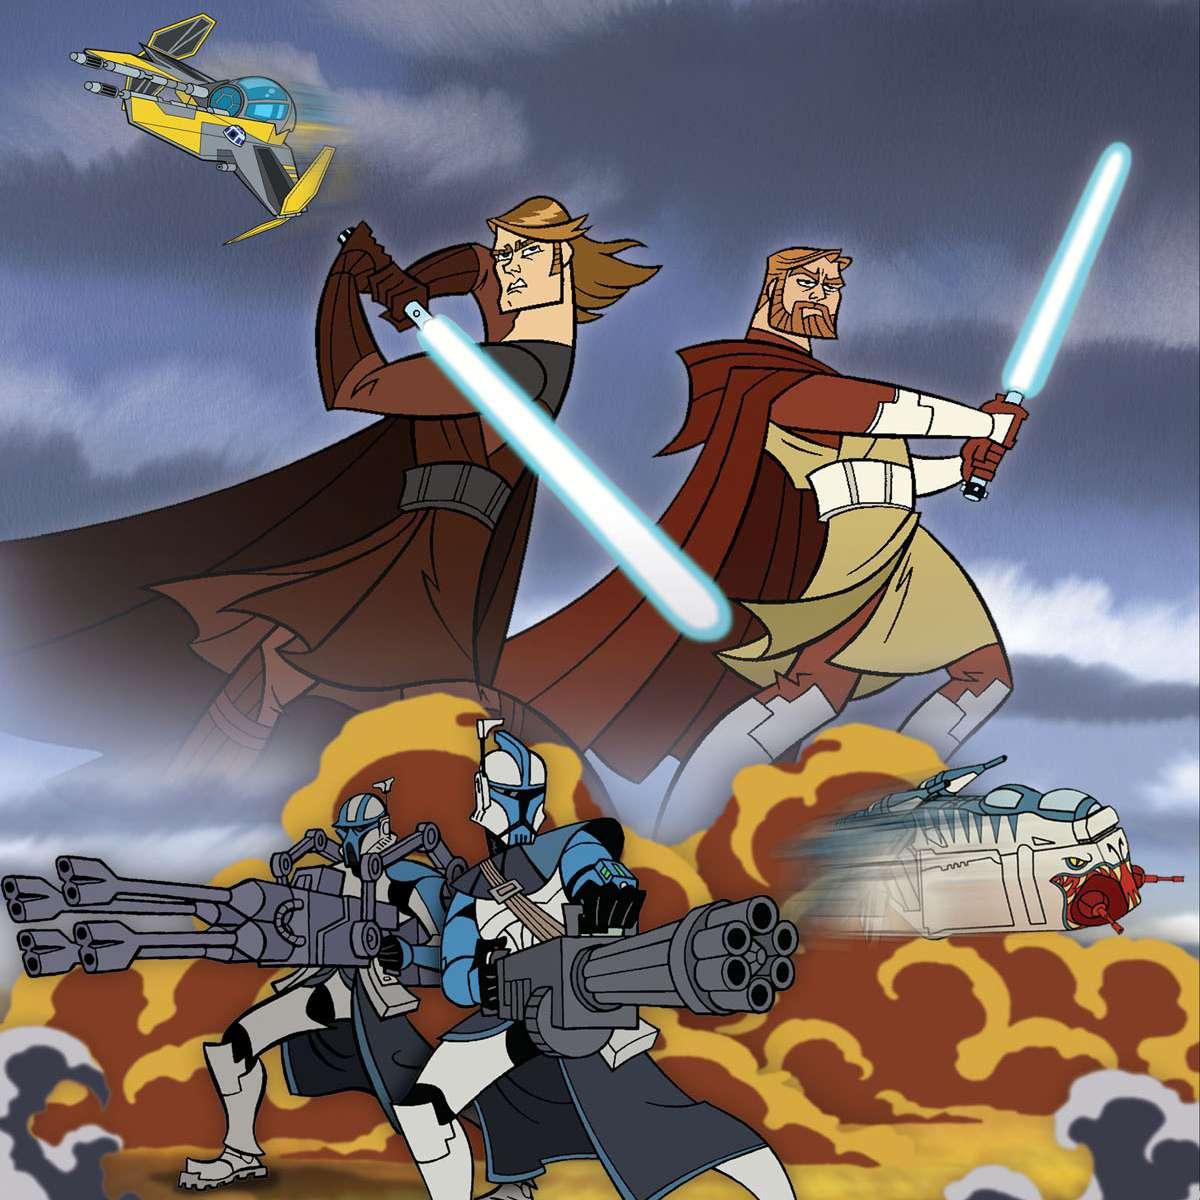 'Clone Wars' Aankin Skywalker and Obi Wan Kenobi